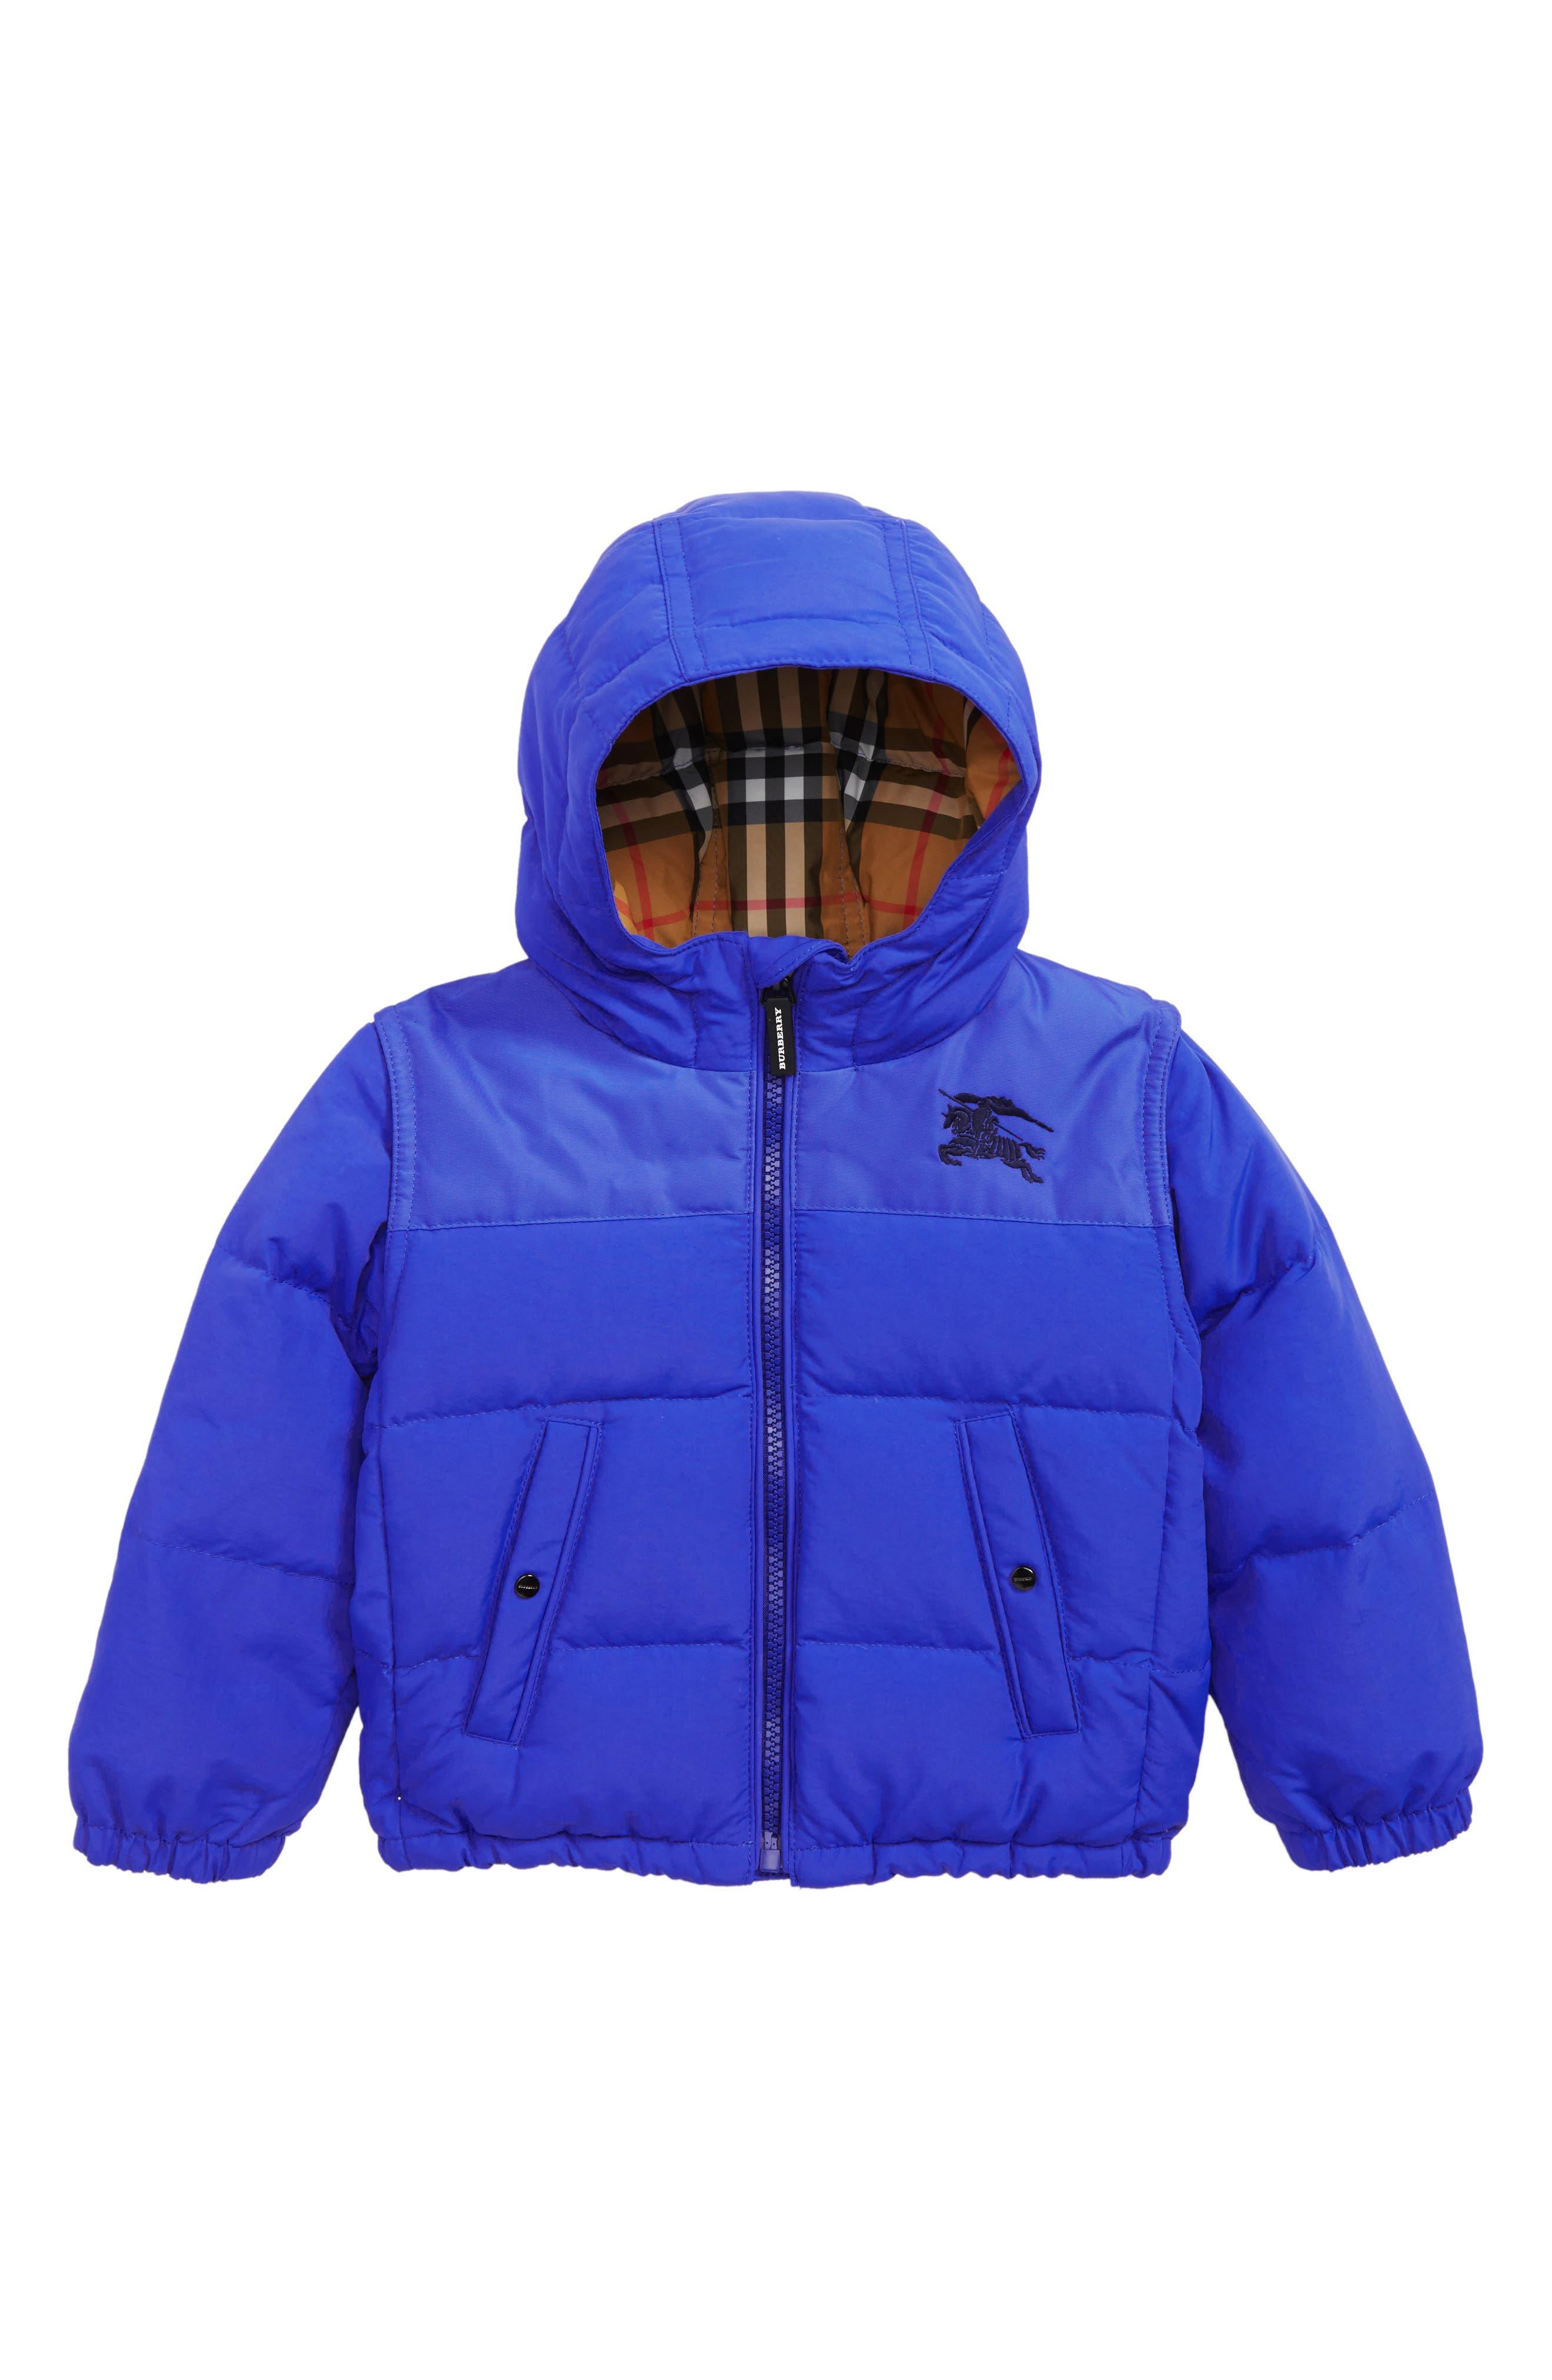 BURBERRY, Mini Ezra Hooded Down Jacket, Main thumbnail 1, color, ROYAL BLUE